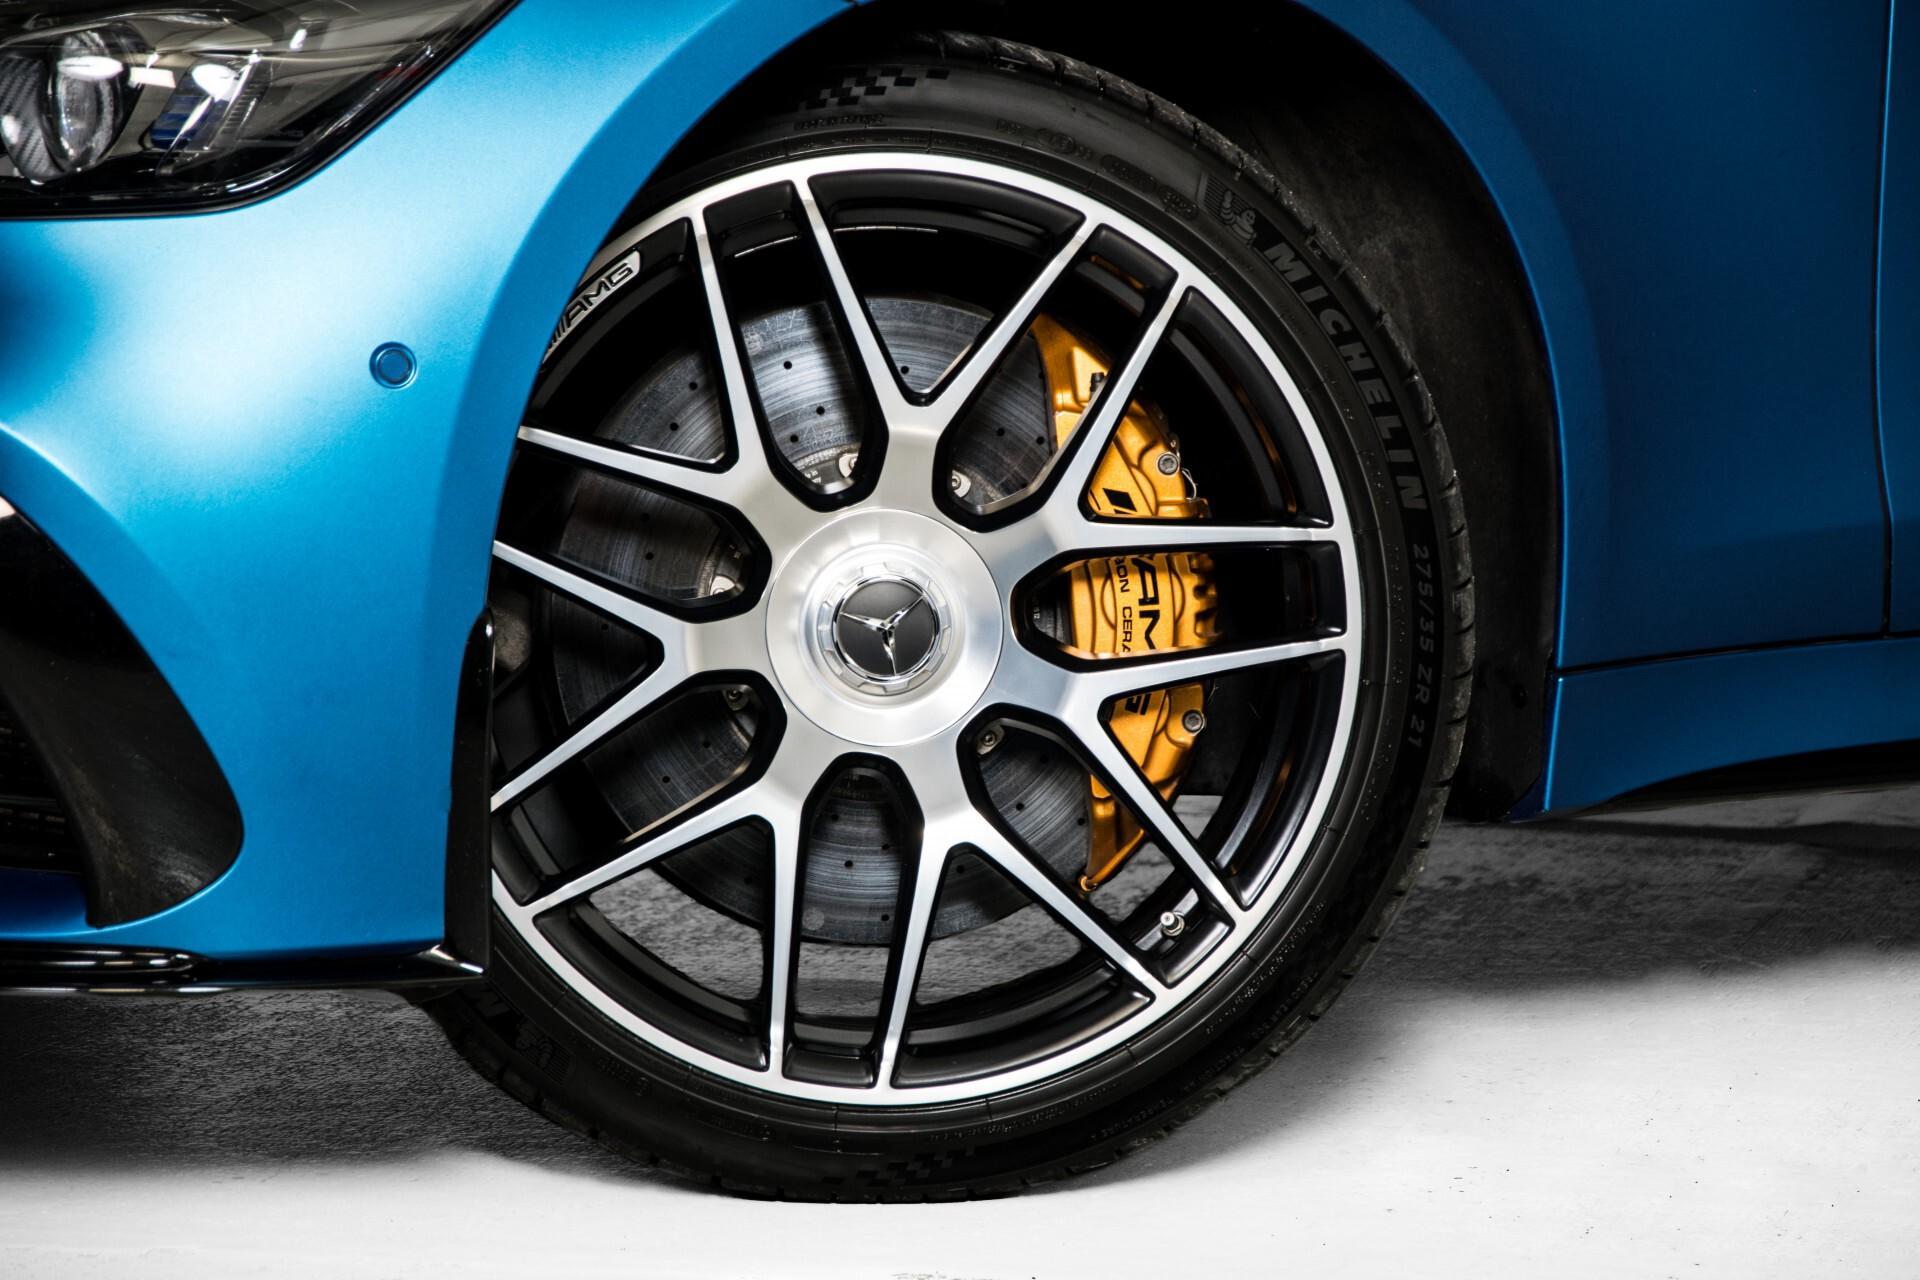 Mercedes-Benz AMG GT 4-Door Coupe 63 S 4MATIC+ Edition 1 Keramisch/Carbon/First Class/Dynamic Plus/Burmester High End 3D Aut9 Foto 92